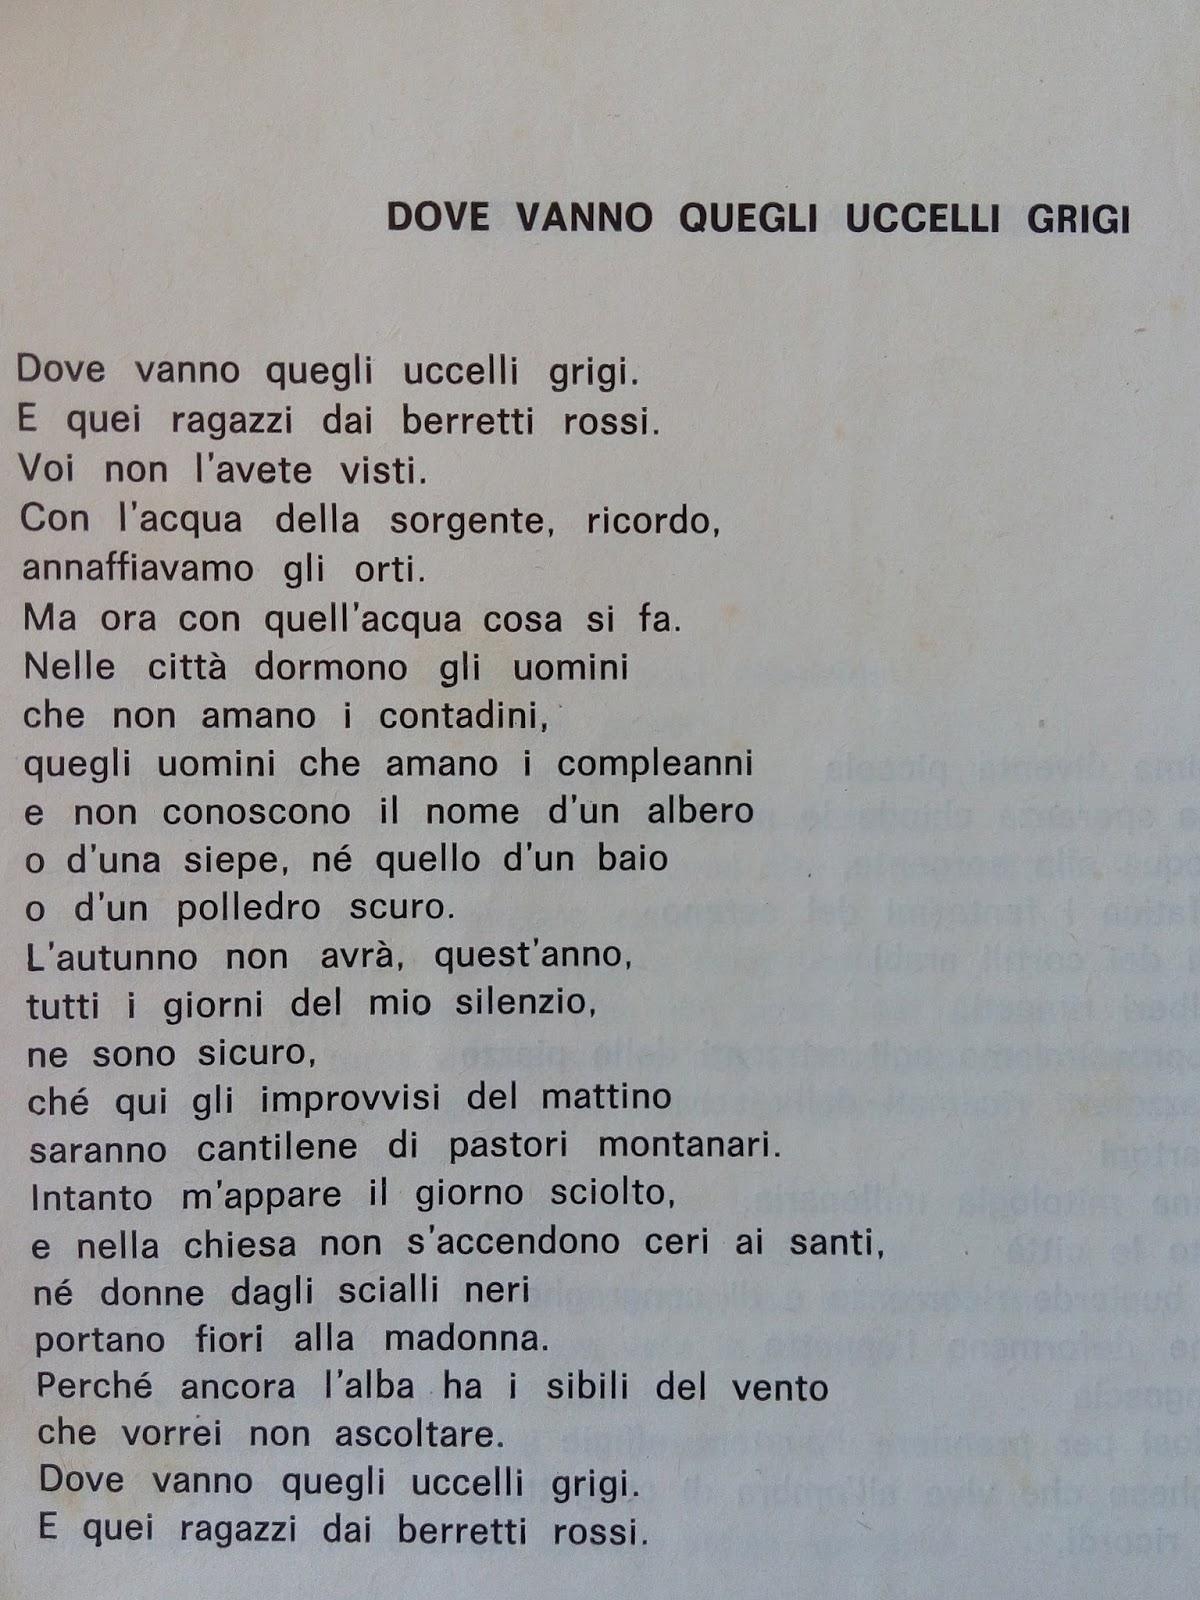 Poesie Di Natale In Dialetto Siciliano.Poesie Sul Natale In Dialetto Siciliano Zo44 Pineglen